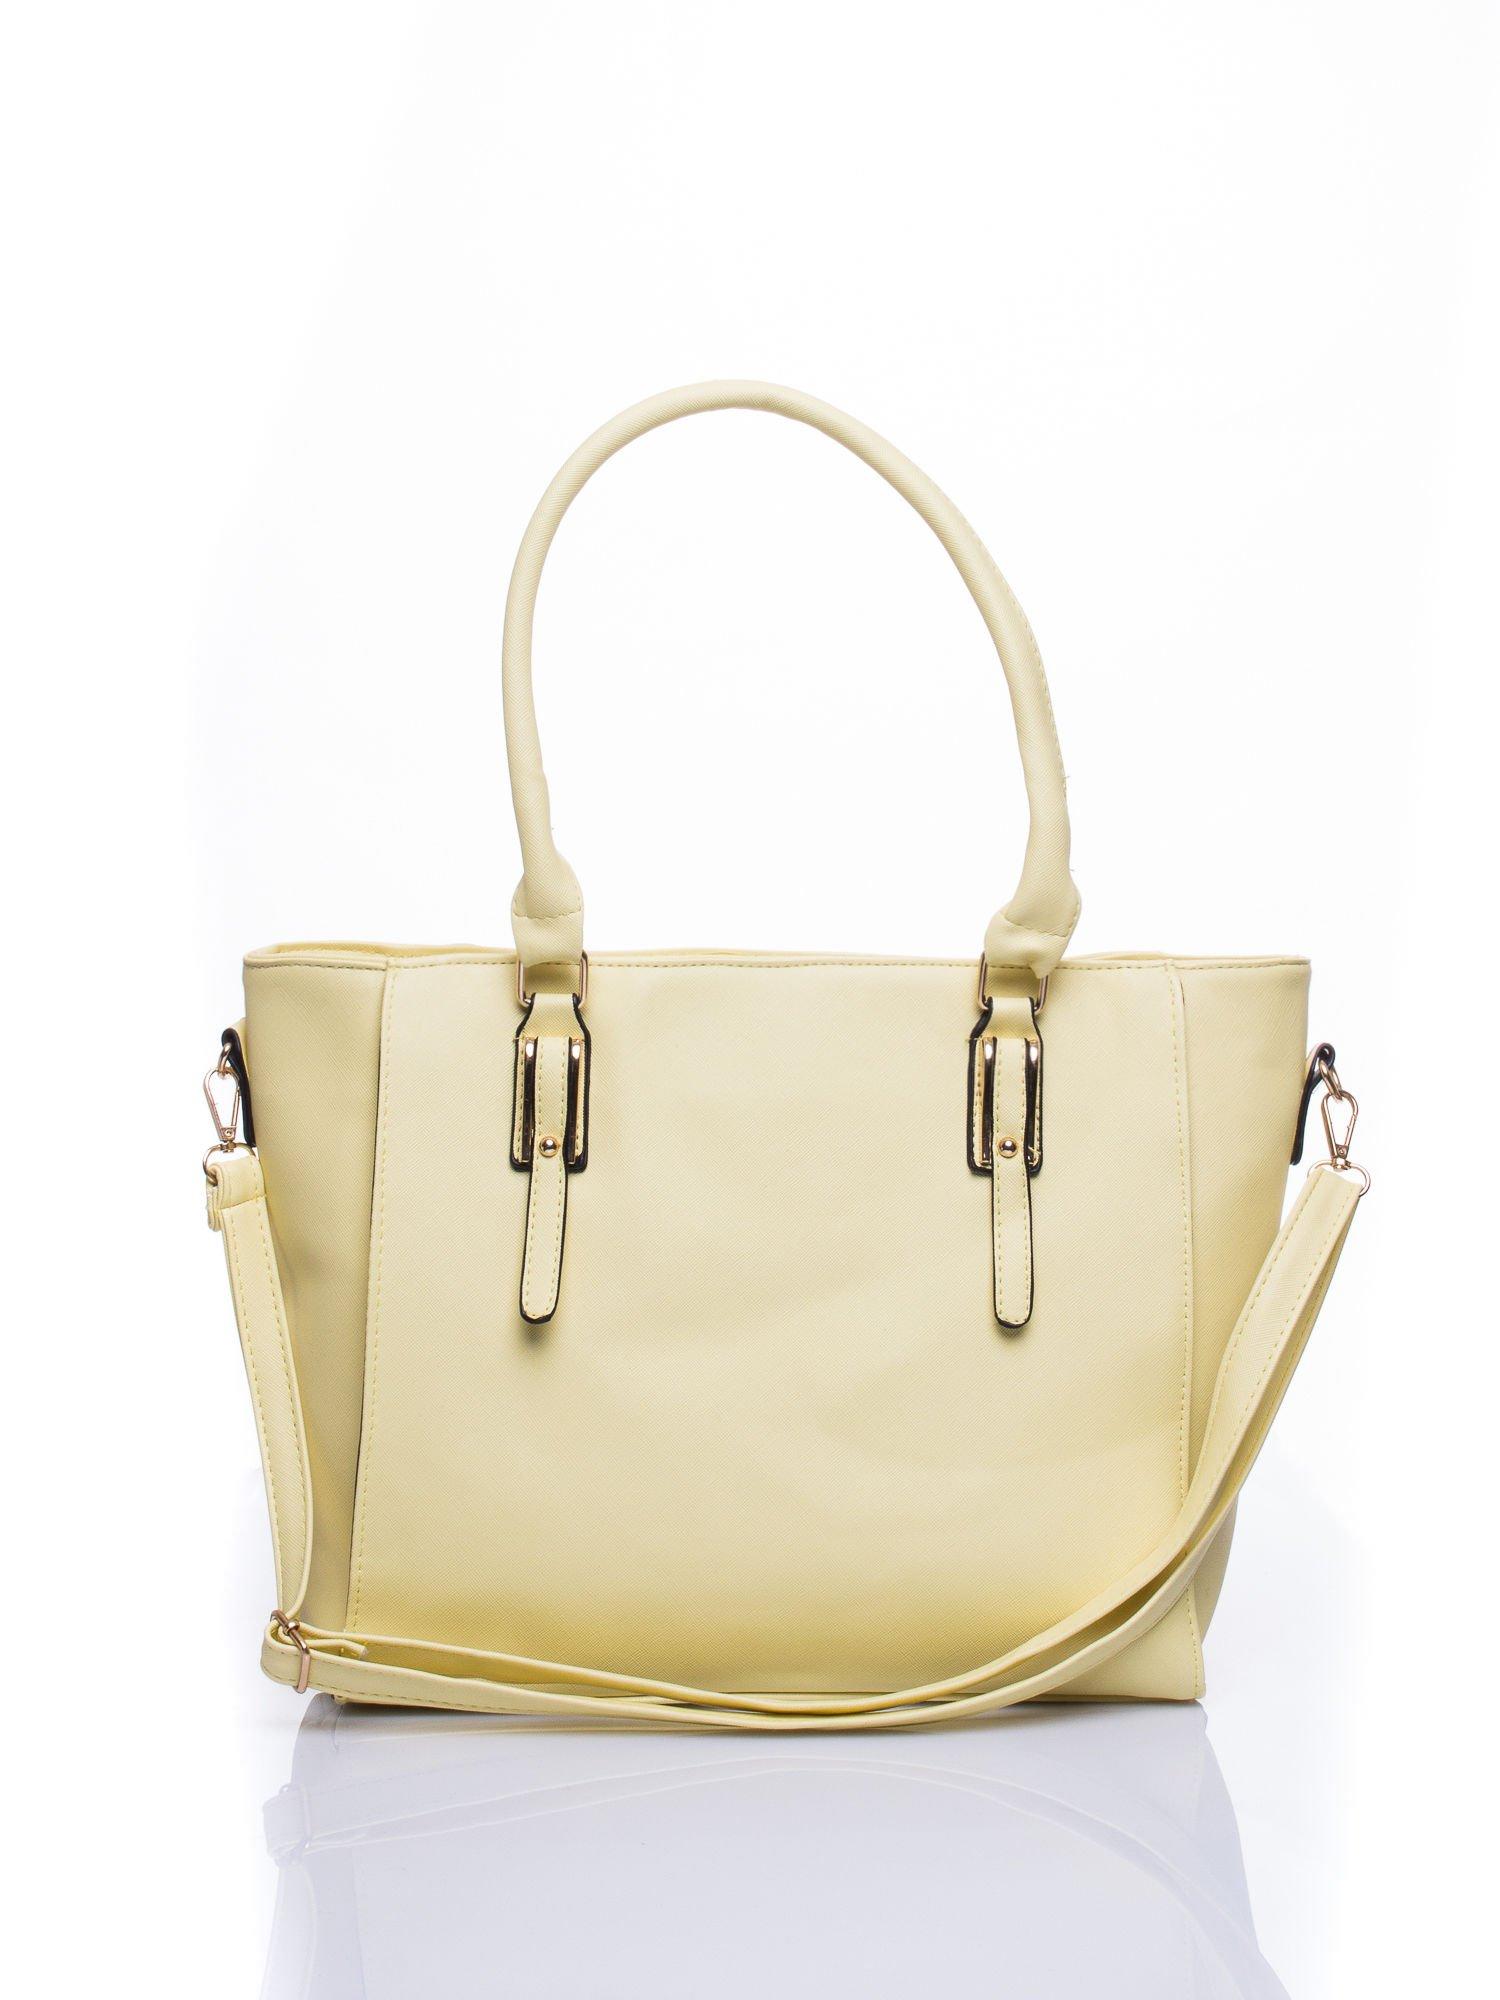 Żółta torba shopper bag z odpinanym paskiem                                  zdj.                                  1